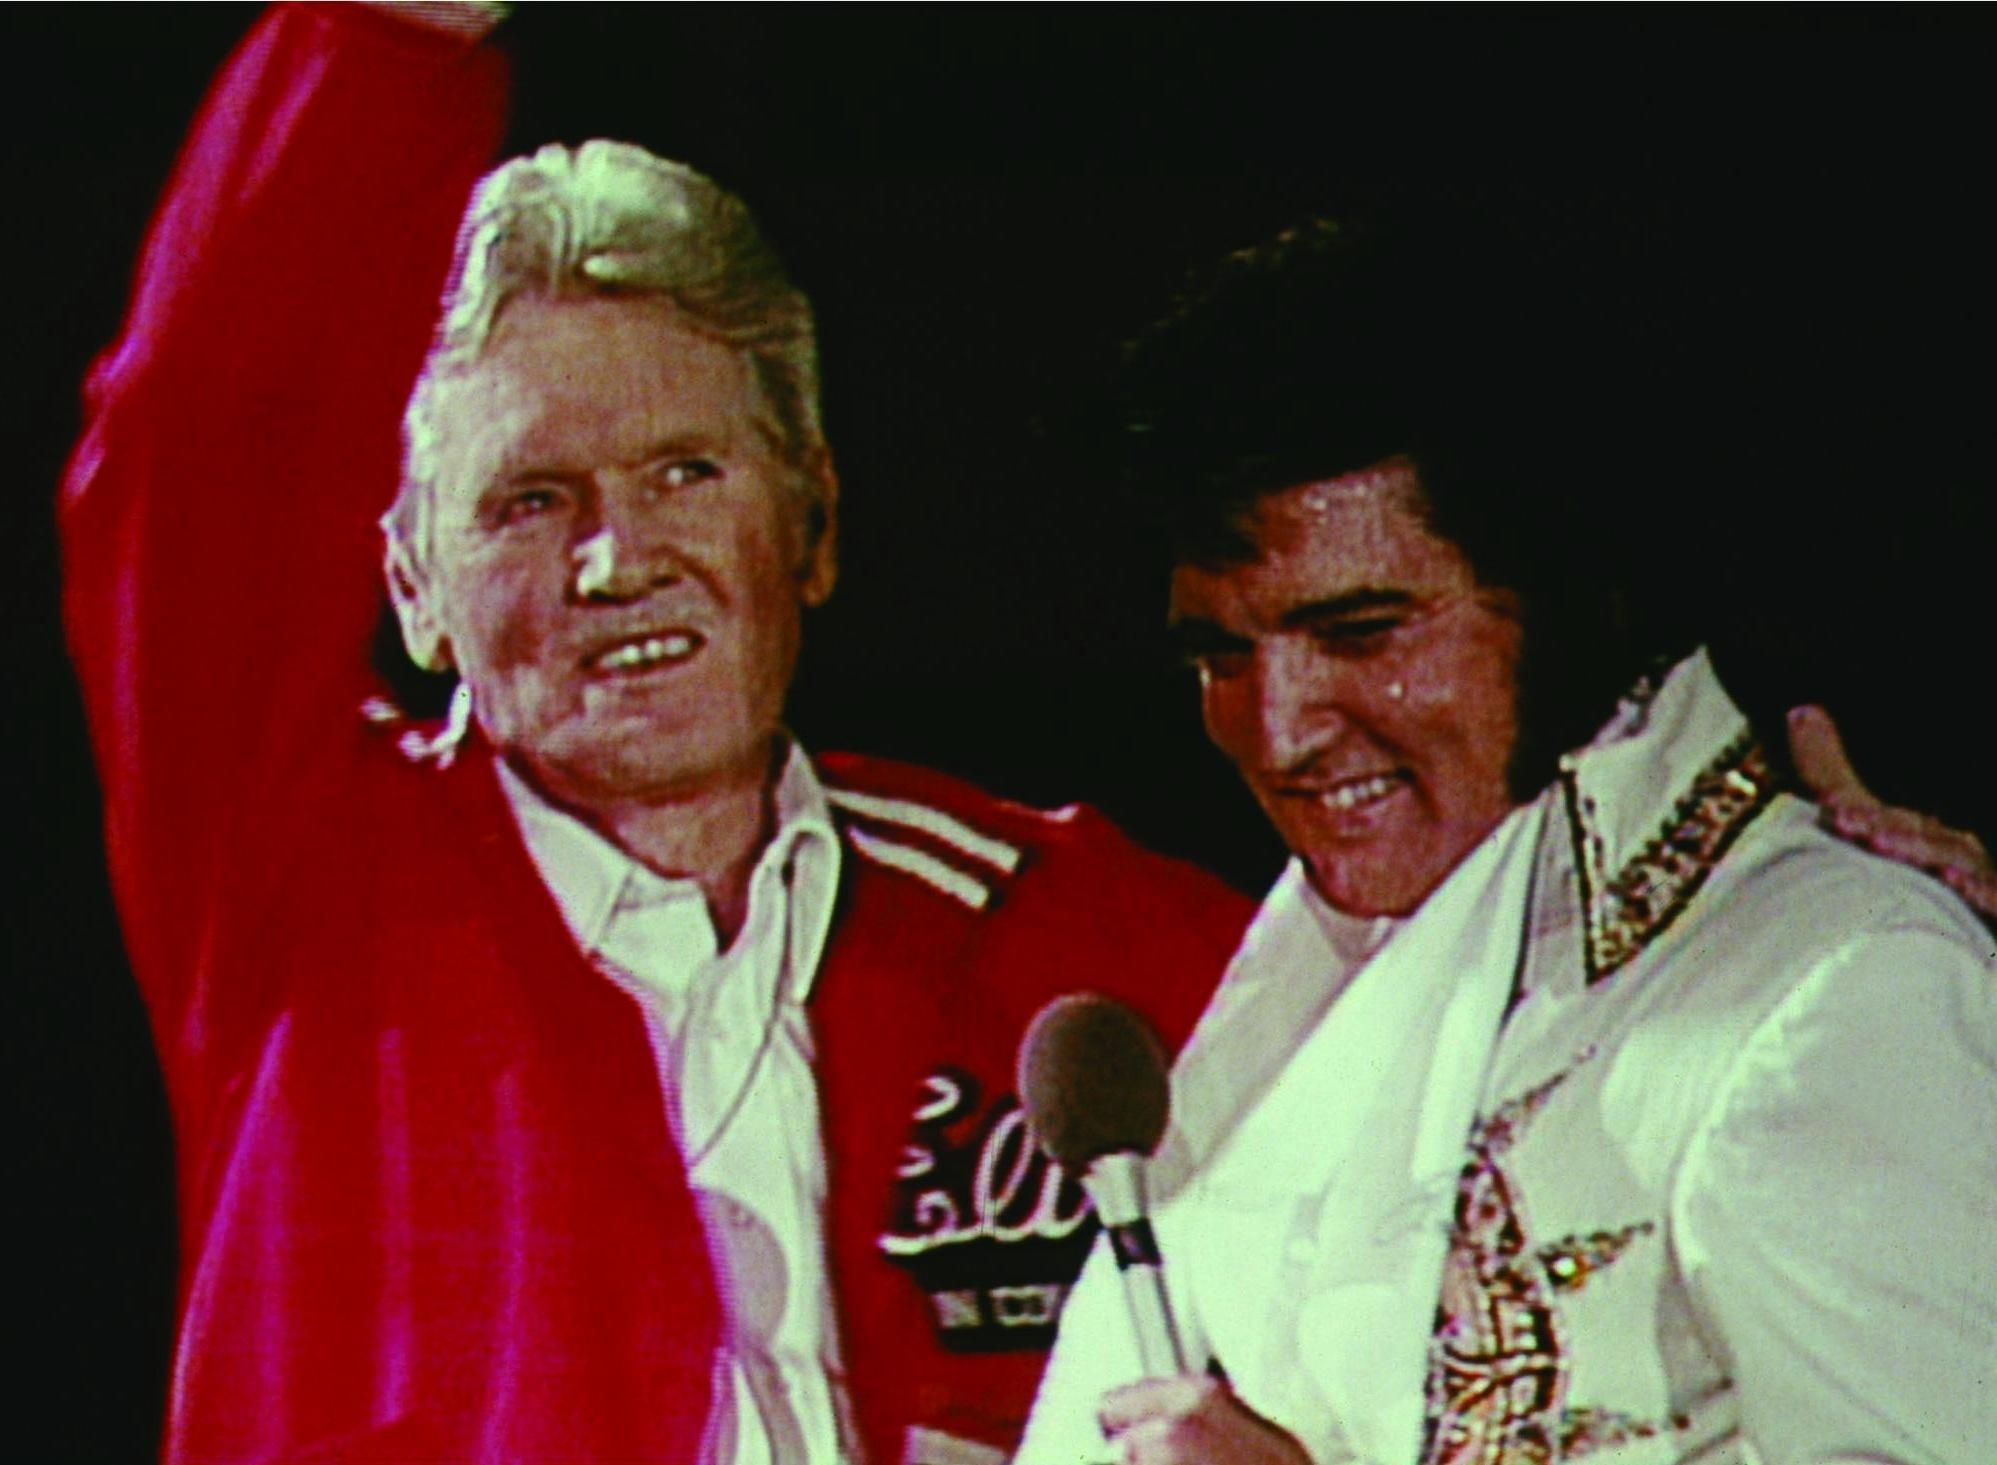 Elvis Presley and Vernon Presley in This Is Elvis (1981)